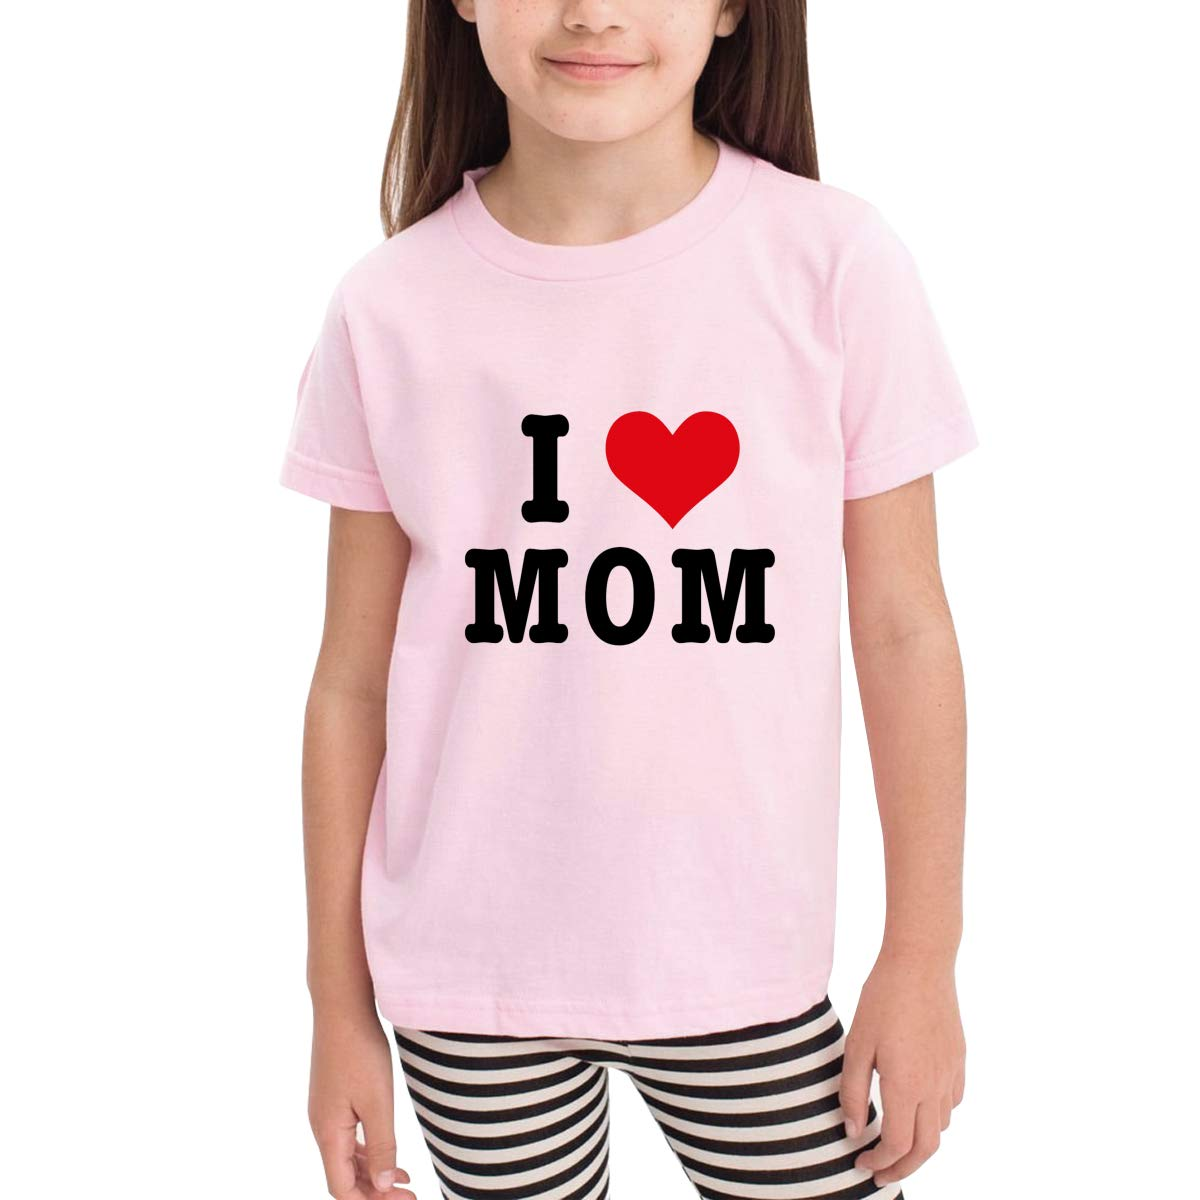 I Love Mom 100/% Organic Cotton Toddler Baby Boys Girls Kids Short Sleeve T Shirt Top Tee Clothes 2-6 T